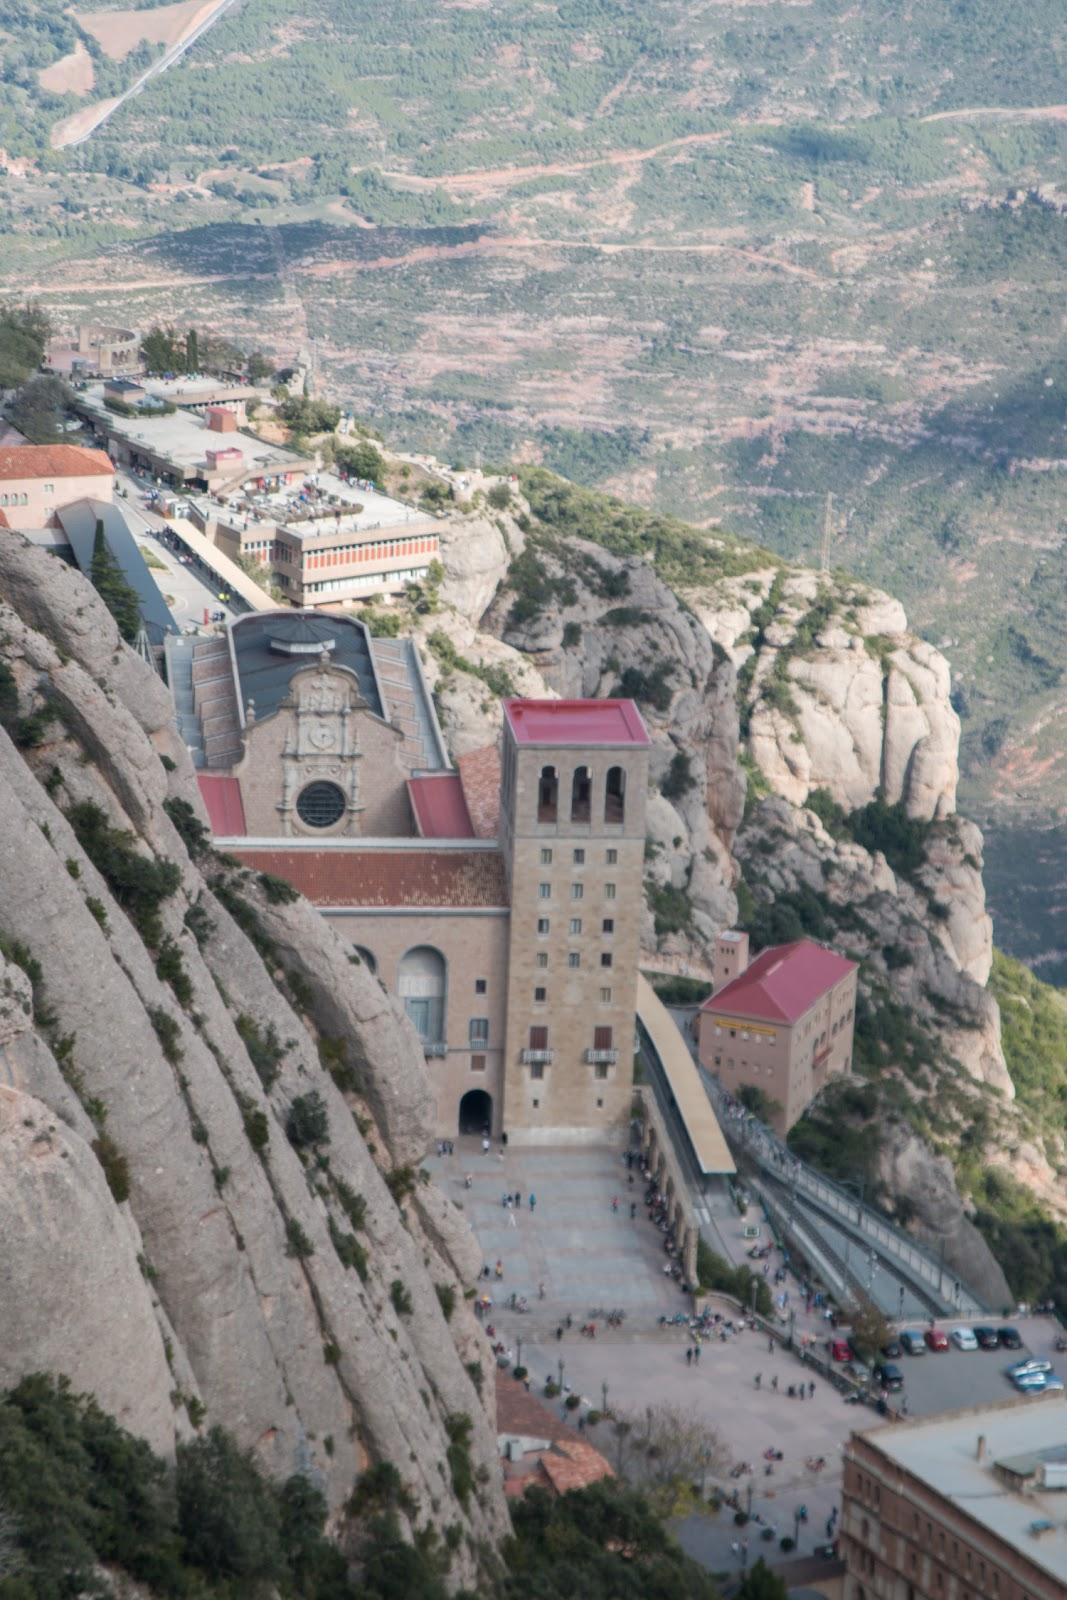 How to get to Montserrat Barcelona